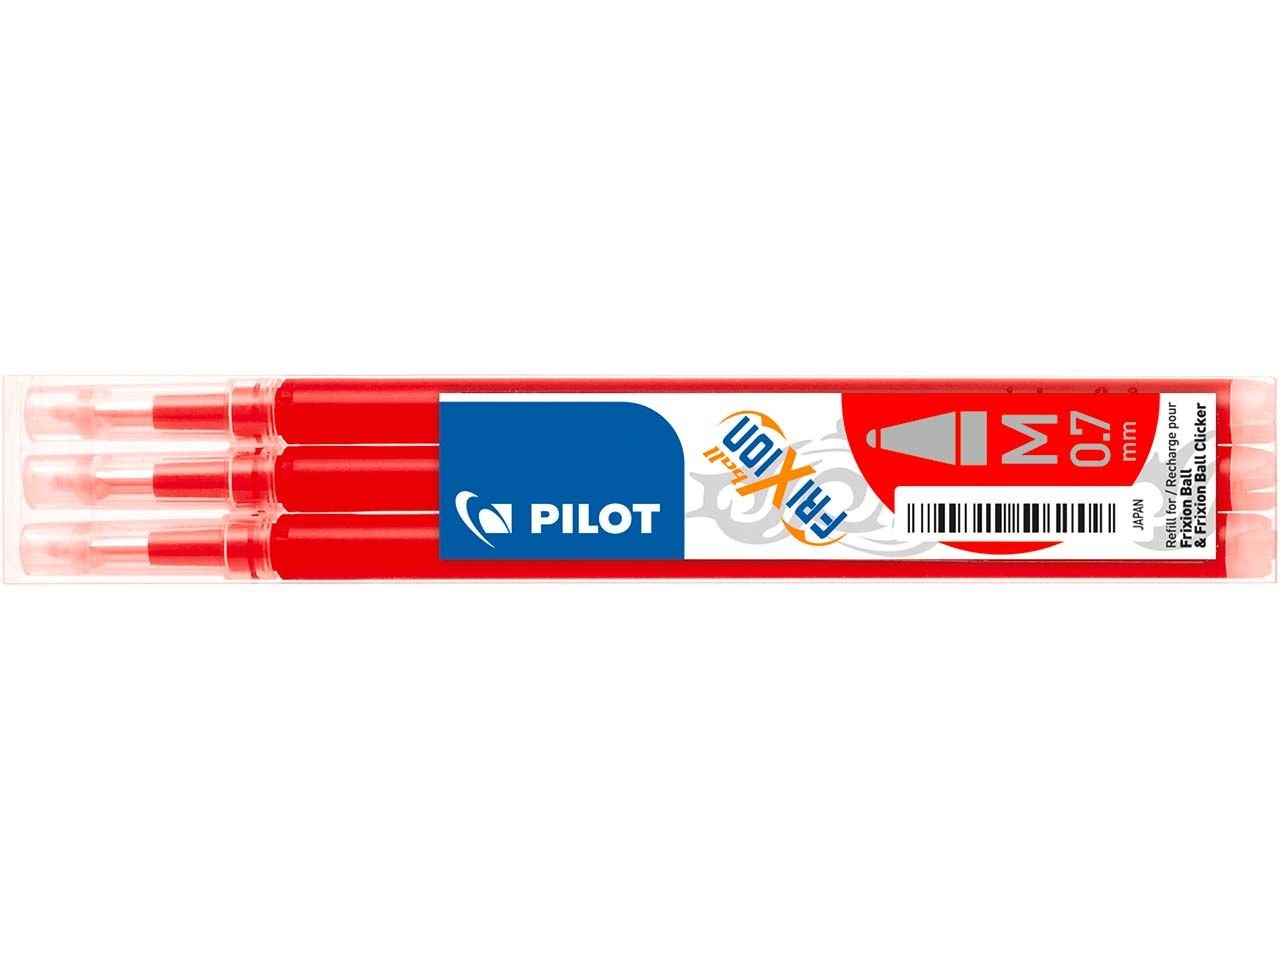 3 Pilot Ersatzminen für Tintenroller